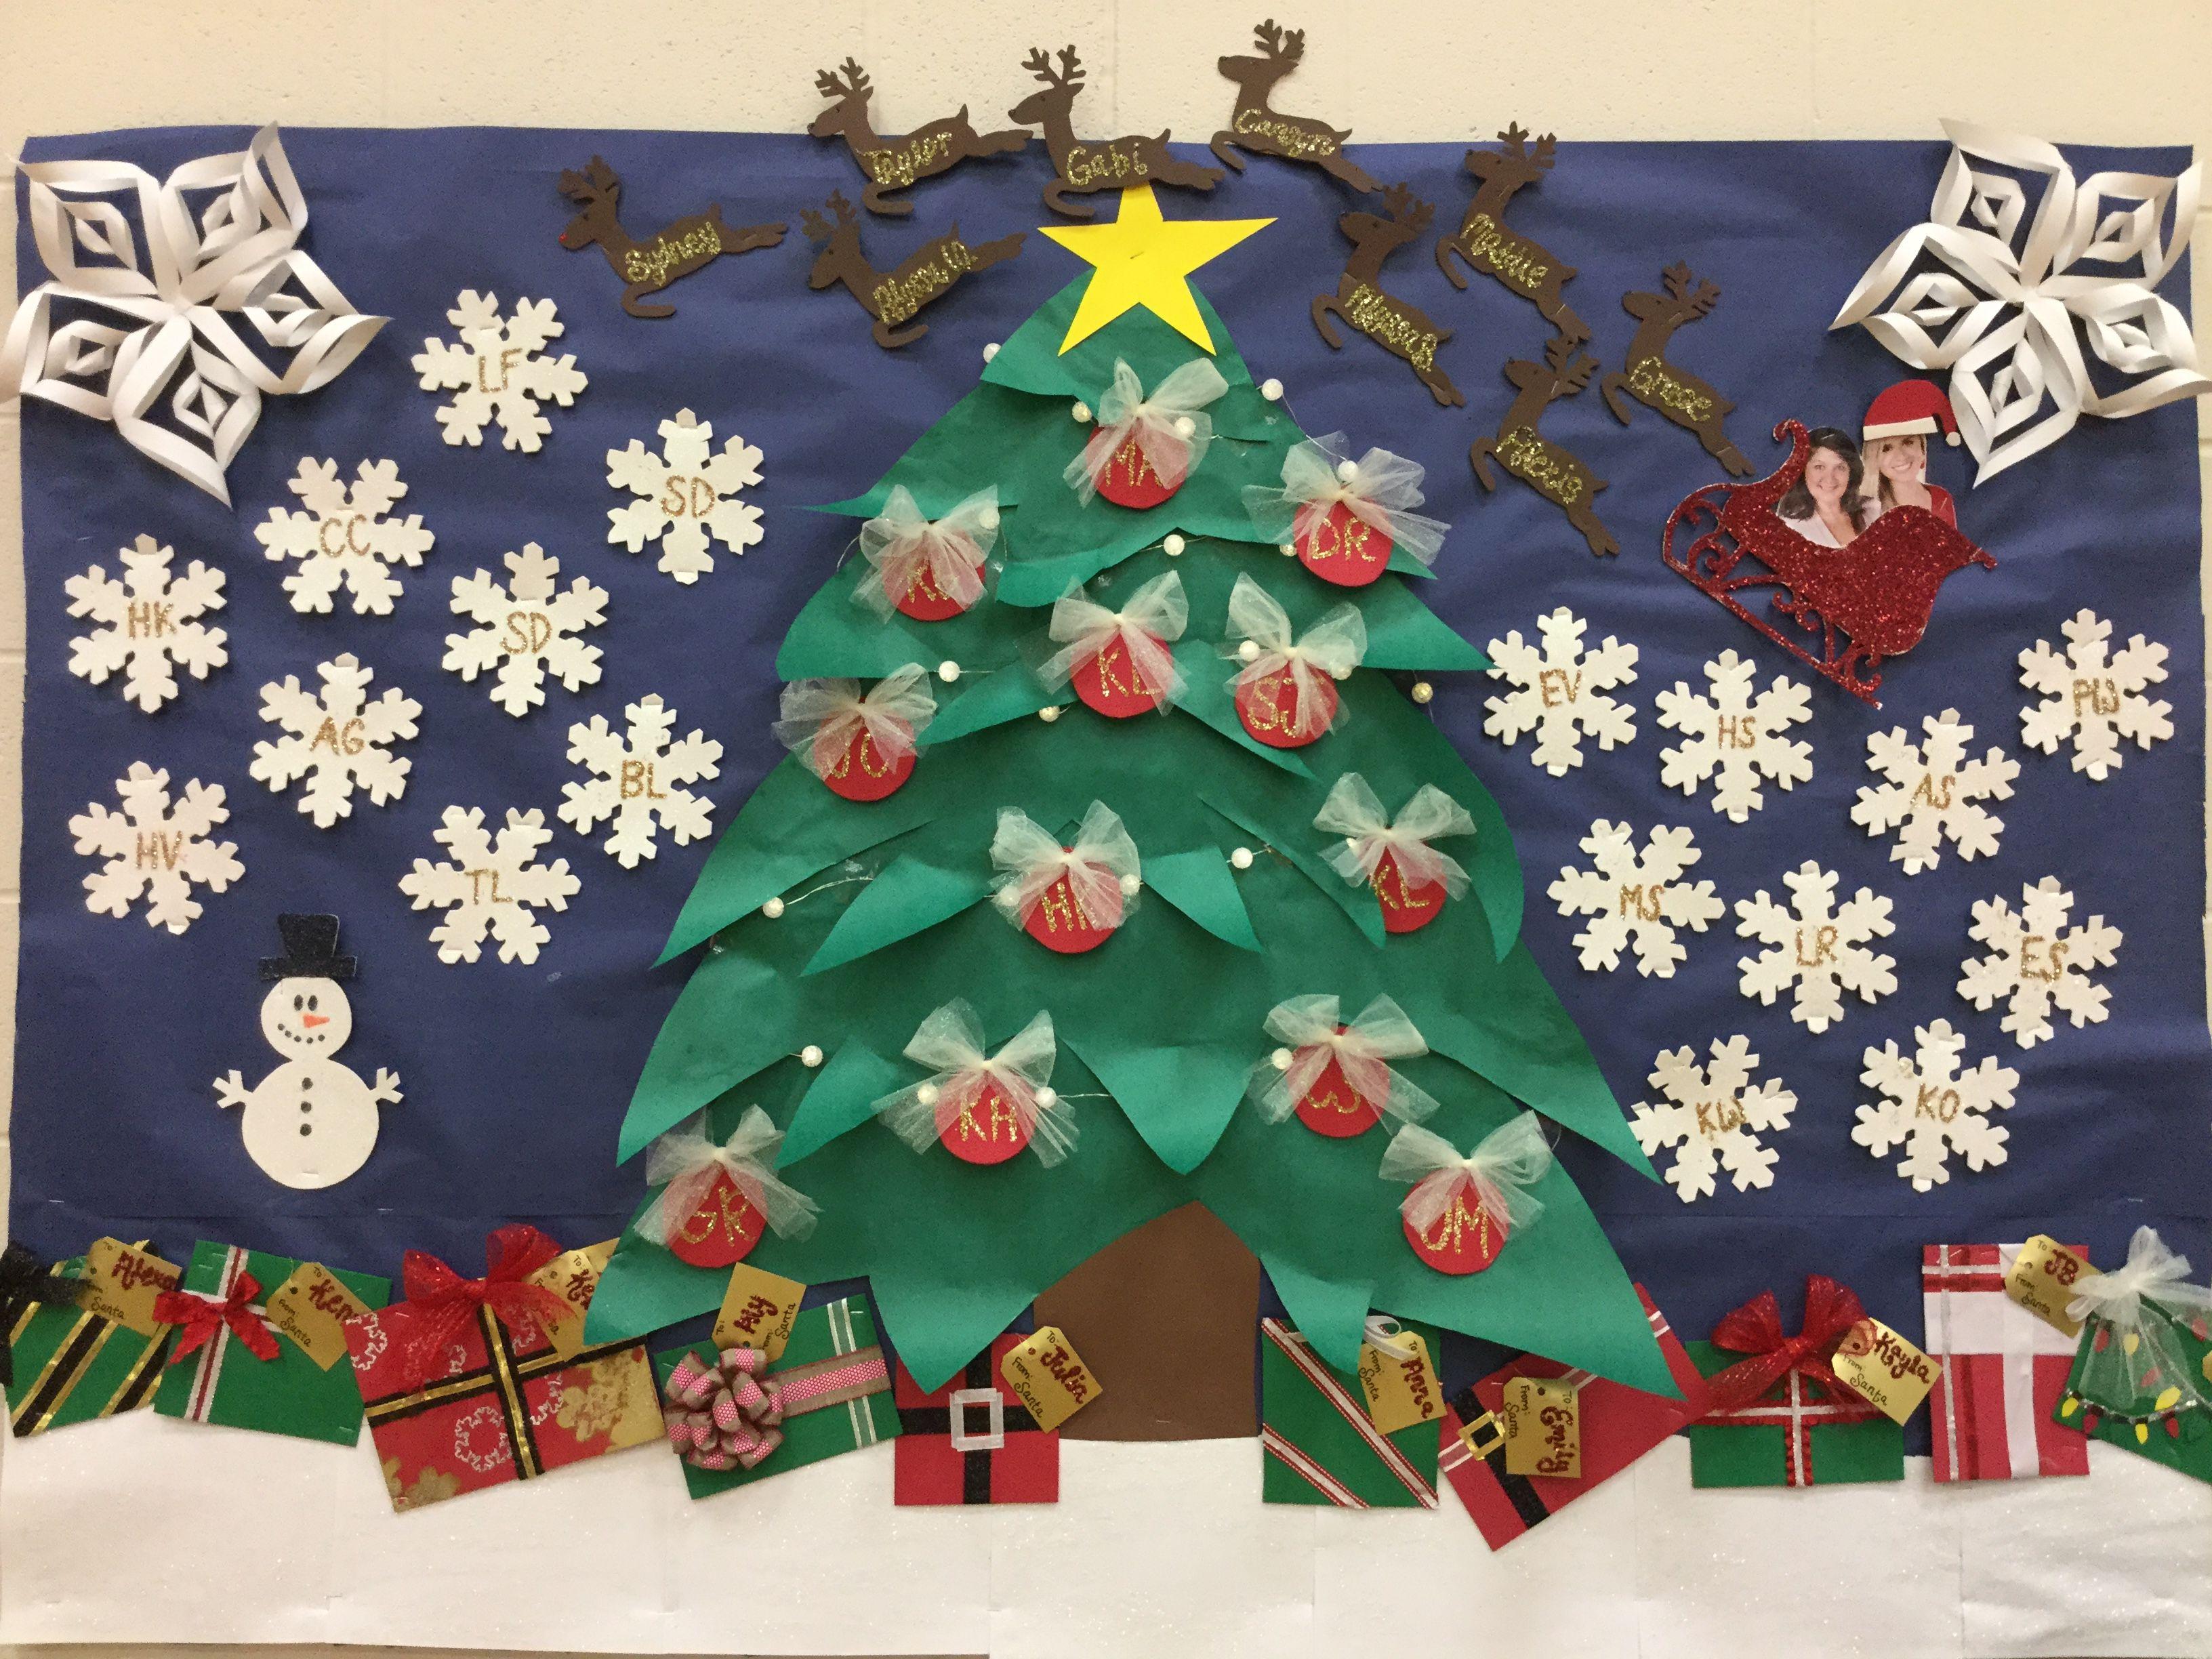 Christmas Board Design.Bulletin Board Idea For Christmas Each Item Has Initials